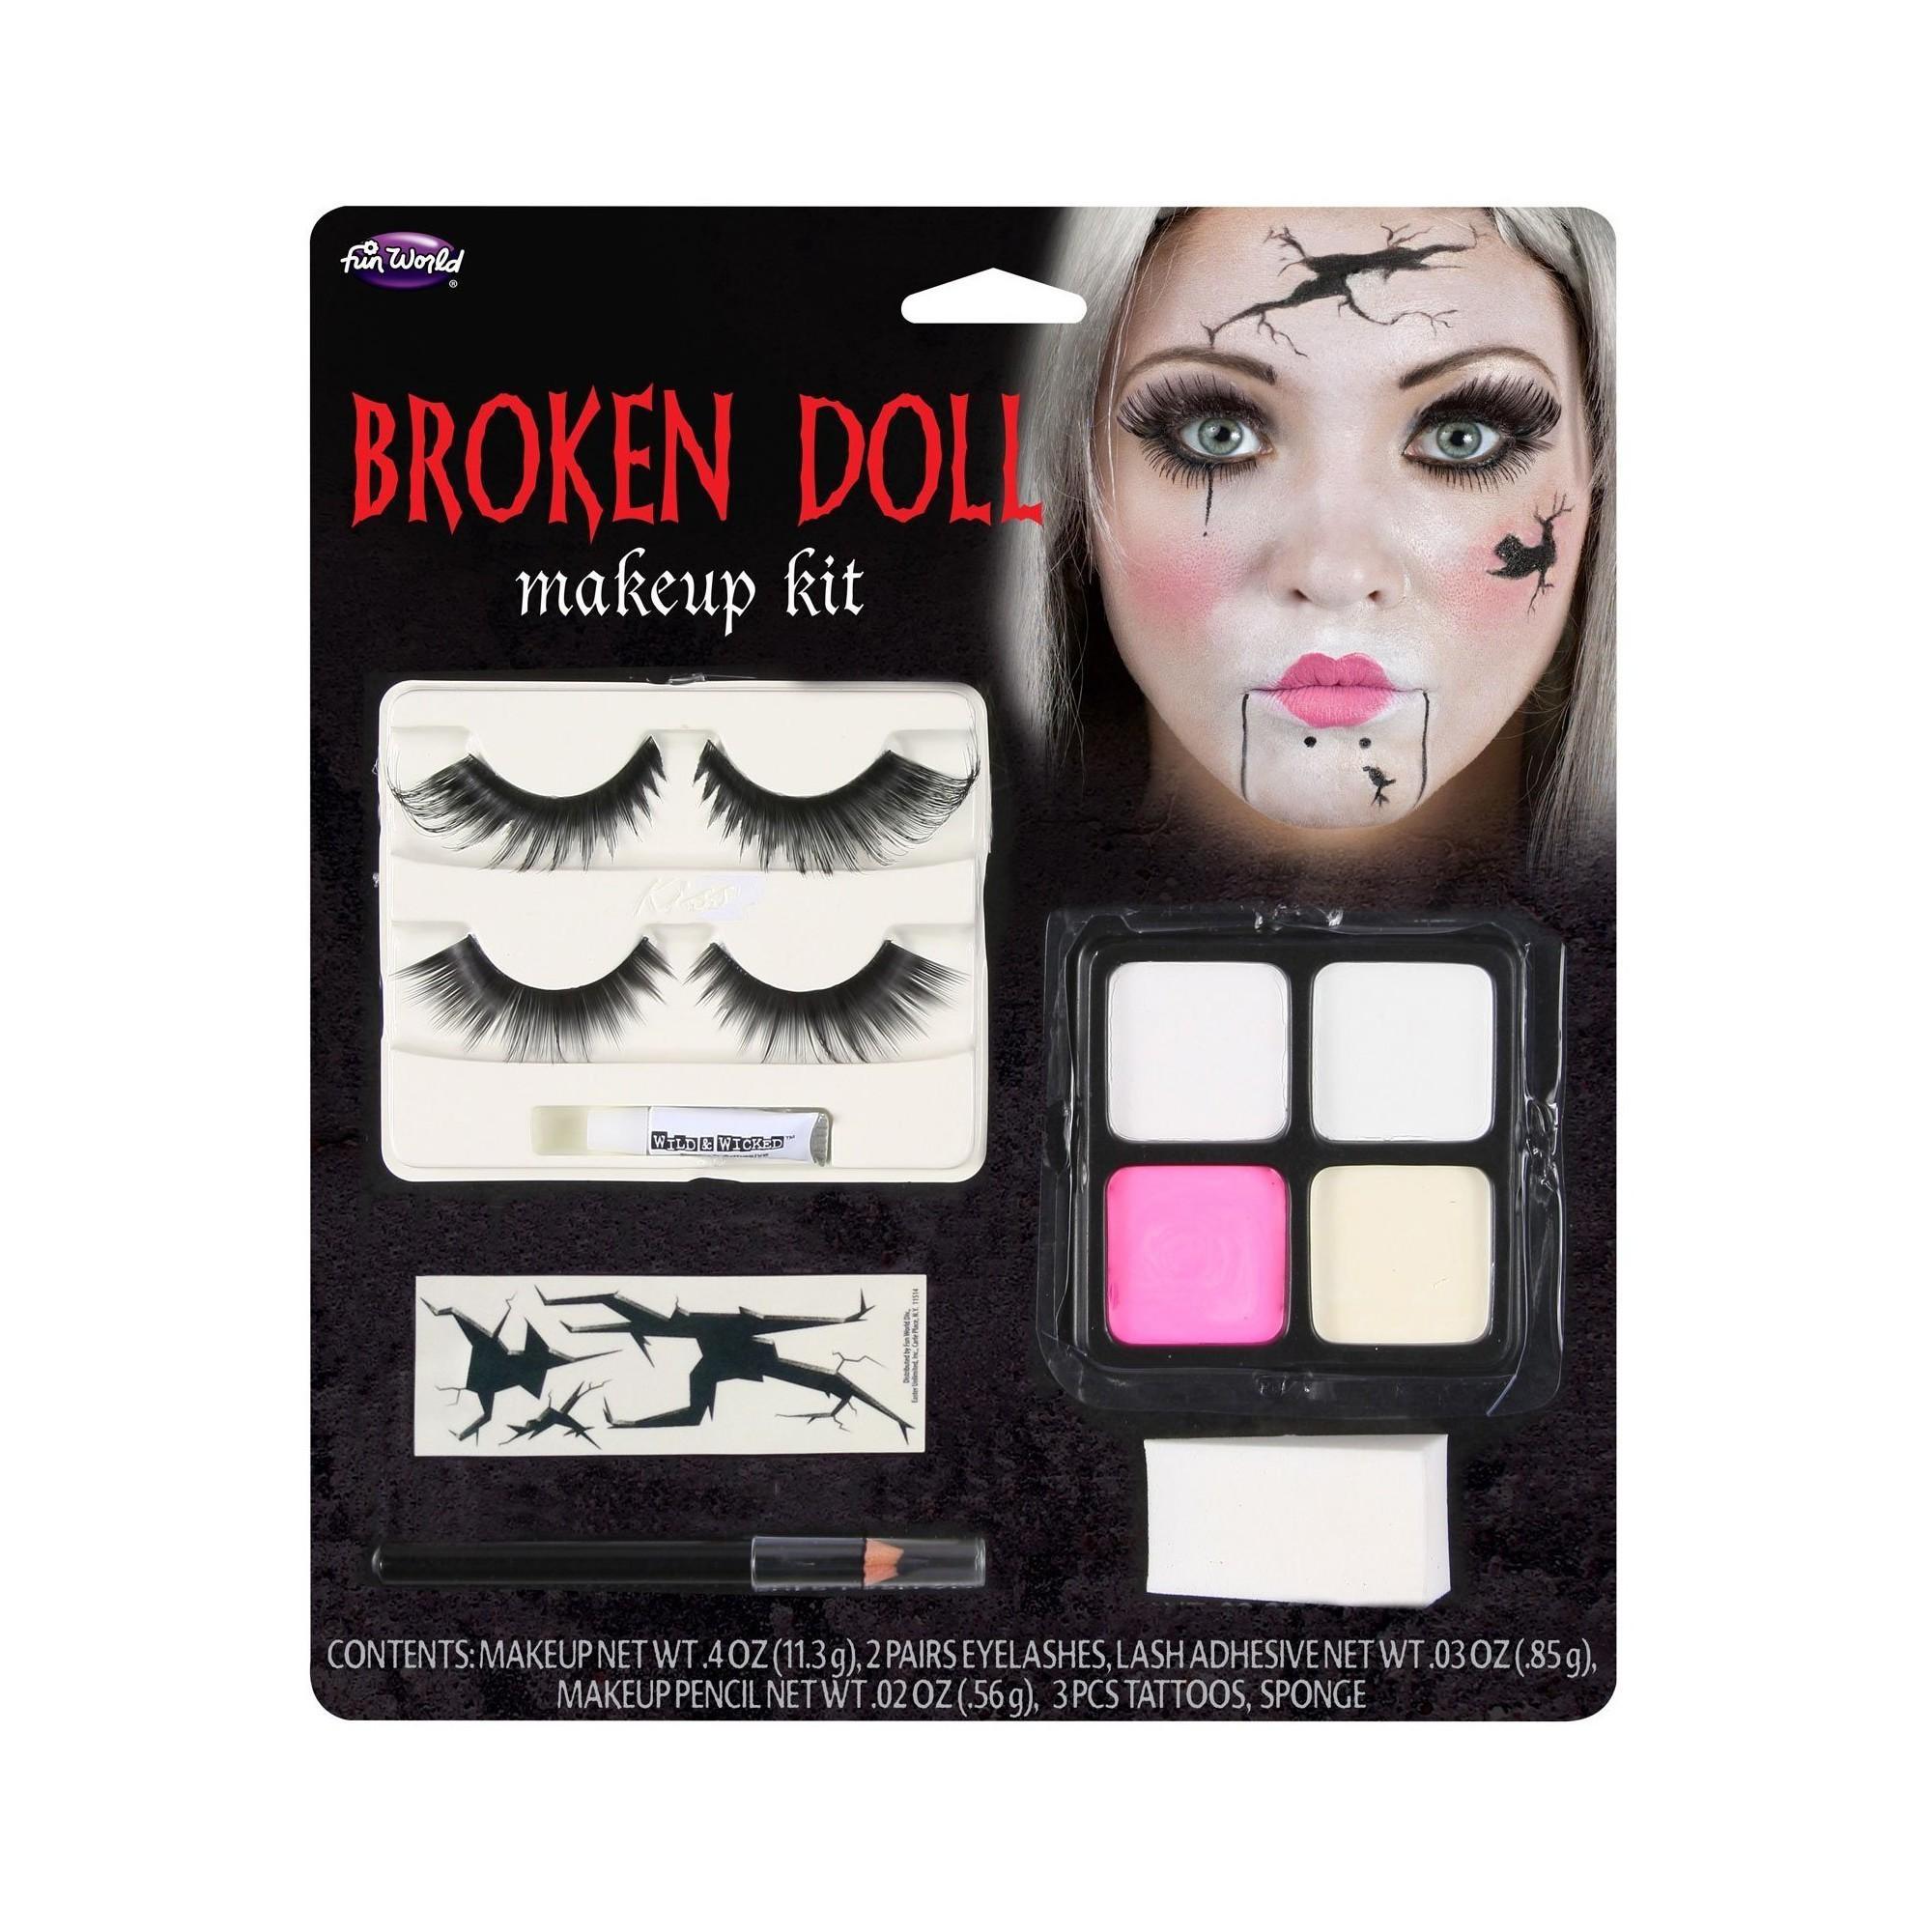 Broken Doll Face Makeup Kit, (With images) Broken doll